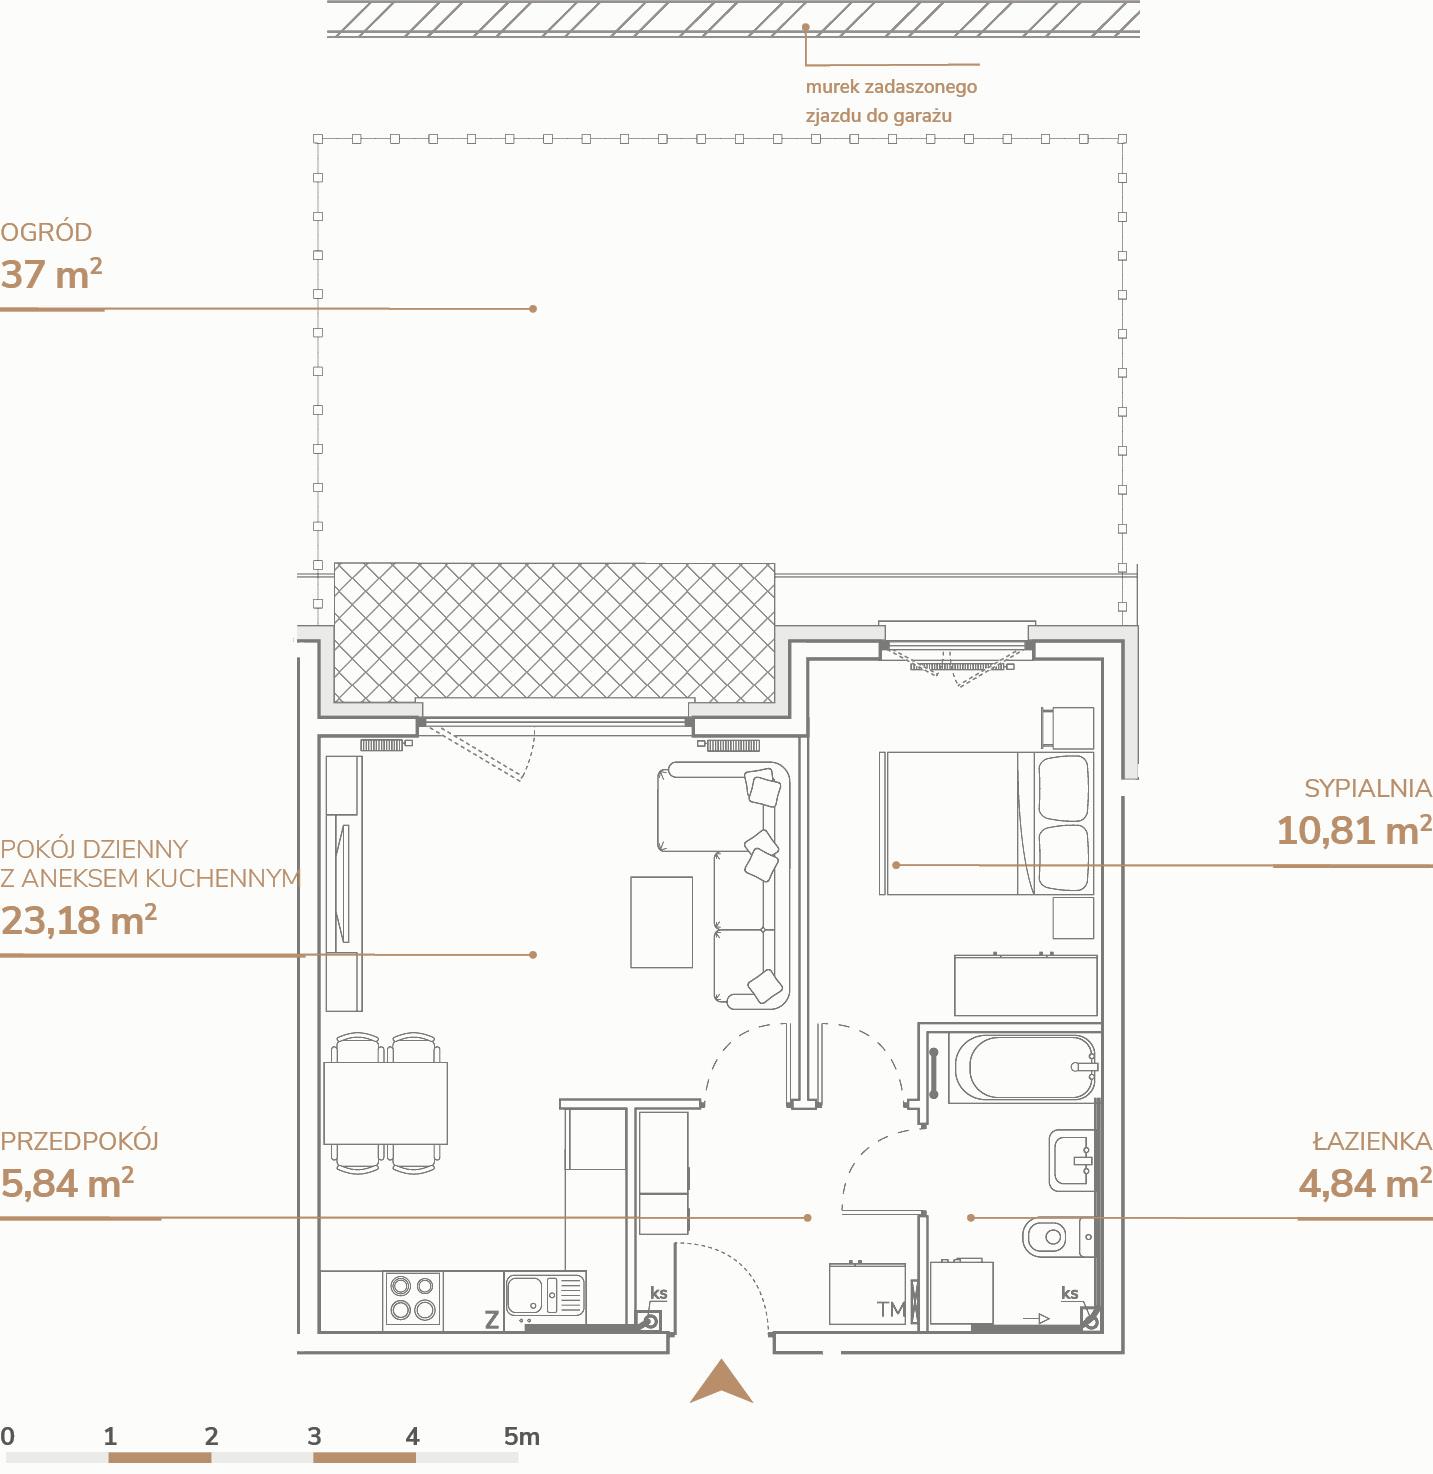 Mieszkanie B1.0.3